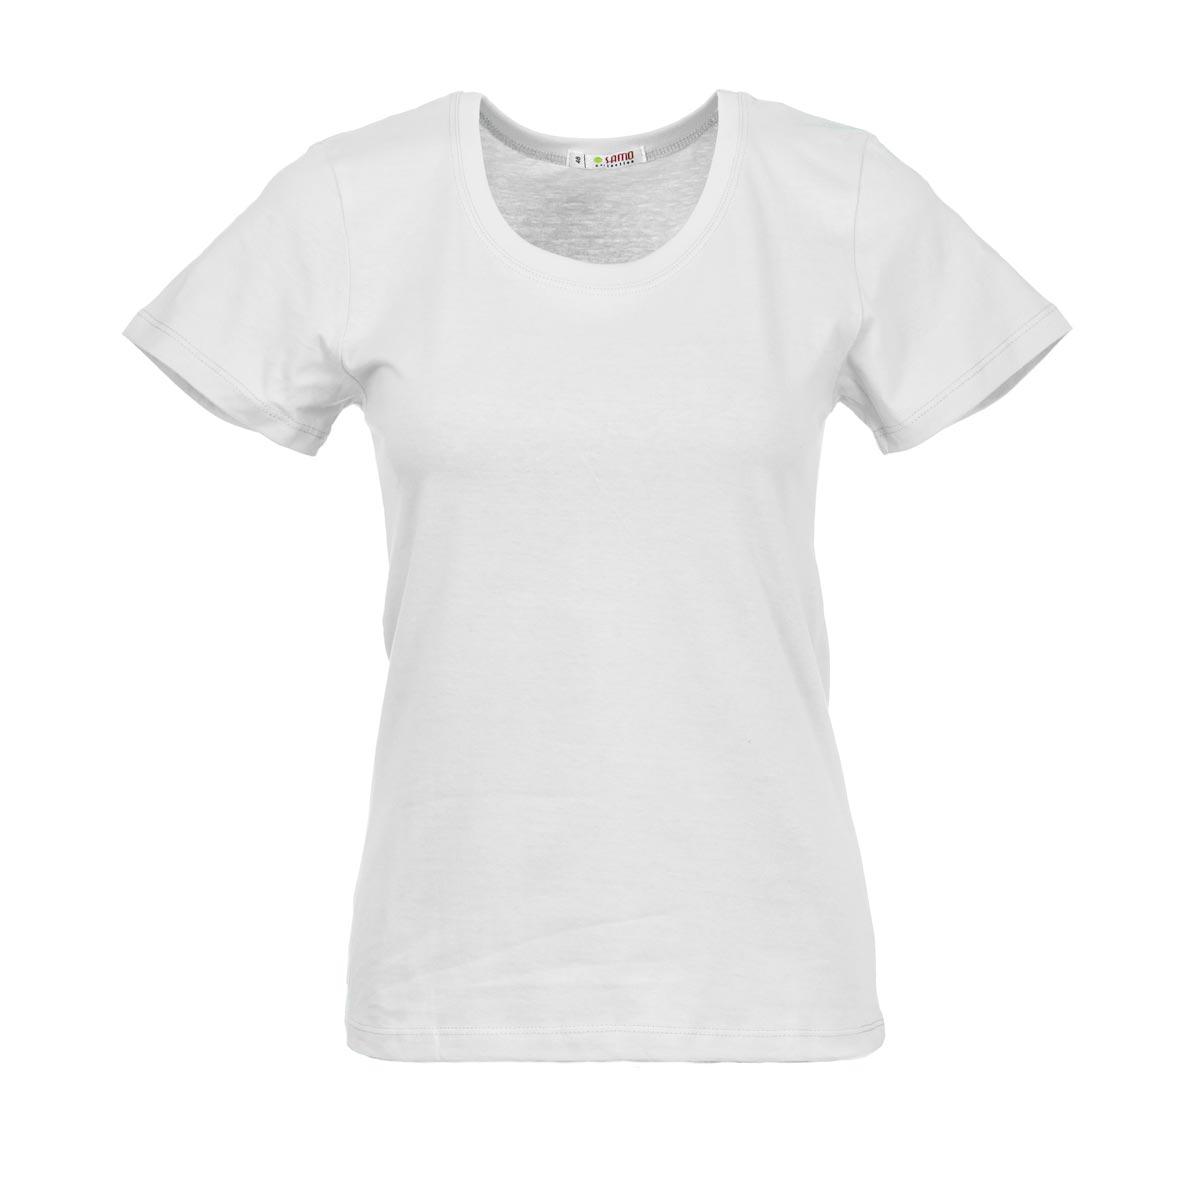 Жен. футболка арт. 04-0045 Белый р. 56Майки и футболки<br>Фактический ОГ: 104 см <br>Фактический ОТ: 100 см <br>Фактический ОБ: 114 см <br>Длина по спинке: 67 см <br>Рост: 164-170 см<br><br>Тип: Жен. футболка<br>Размер: 56<br>Материал: Супрем